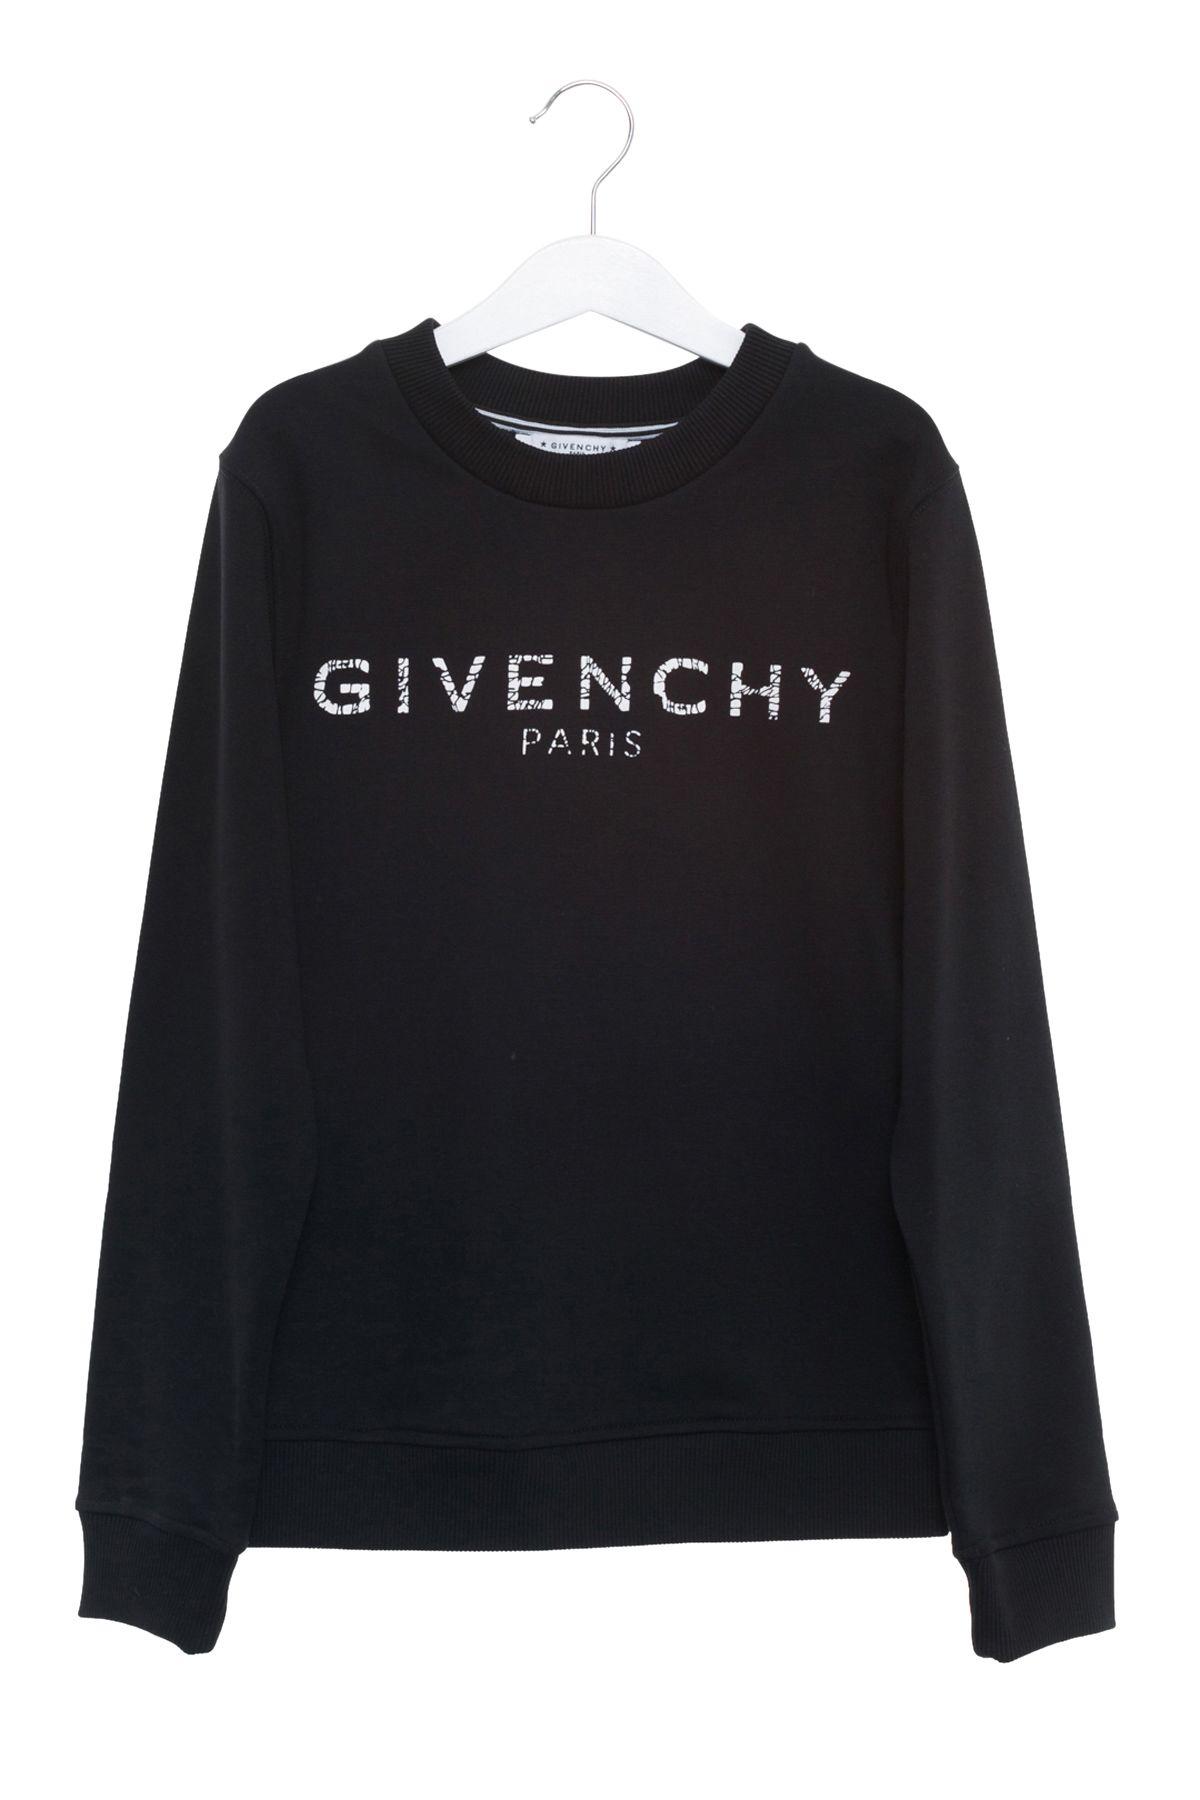 22a3e99a5b1fb Givenchy Givenchy Logo Sweatshirt - Nero - 10905926 | italist